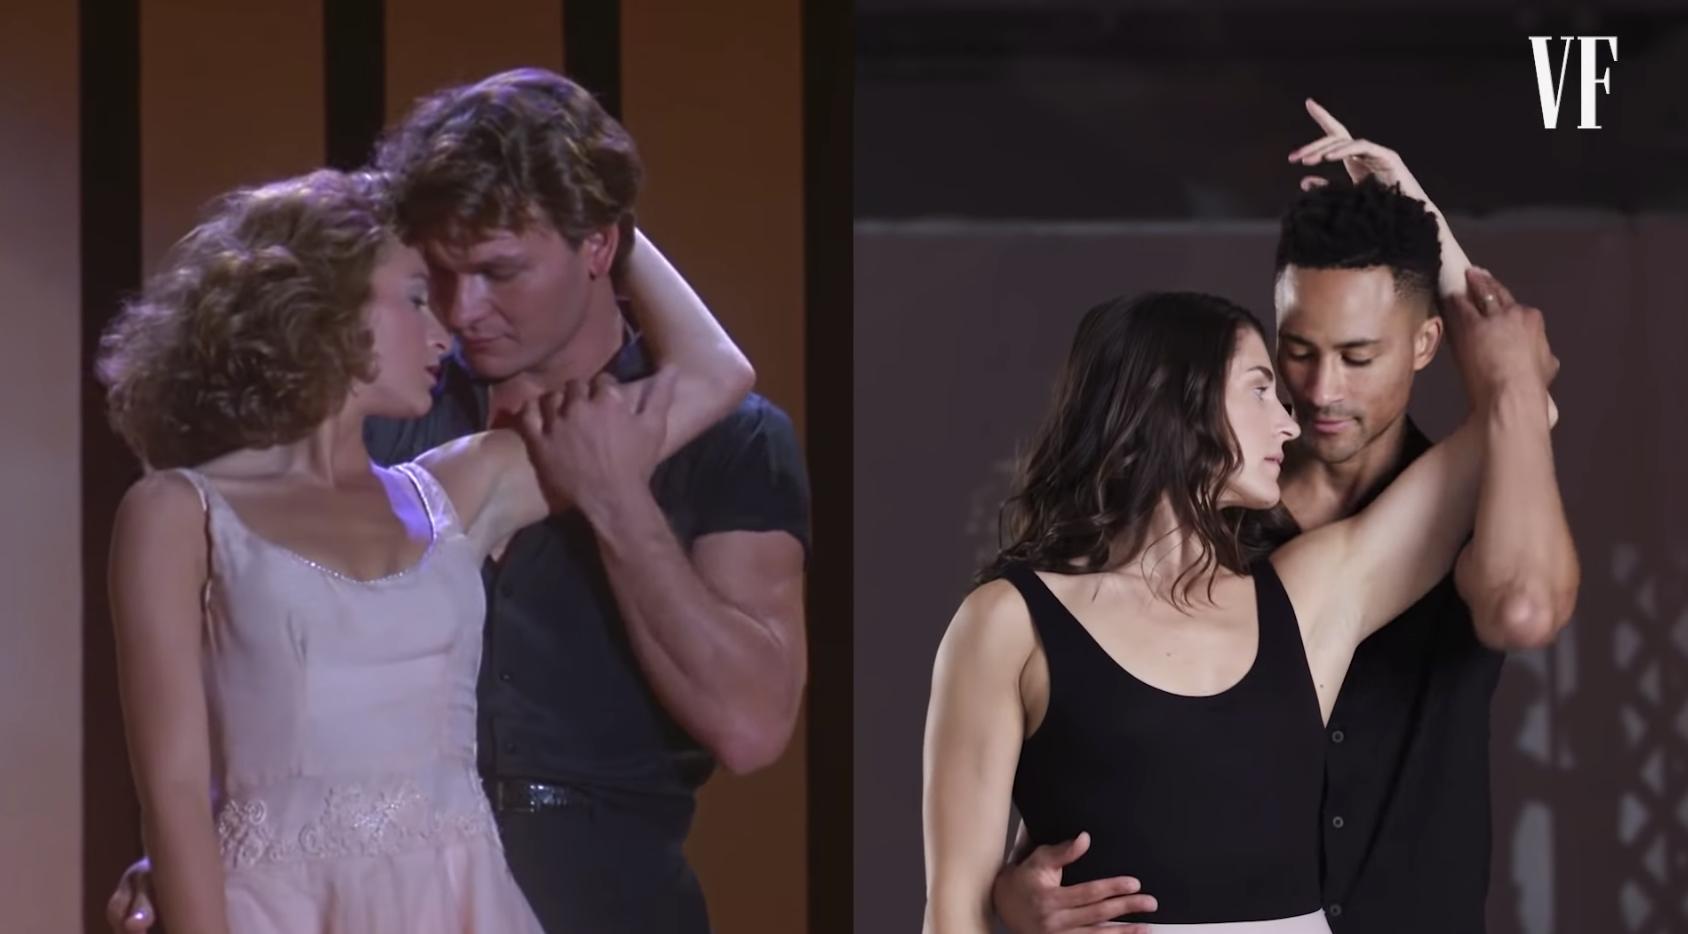 Choreographers Break Down The Final Dance Scene From 'Dirty Dancing' - Digg